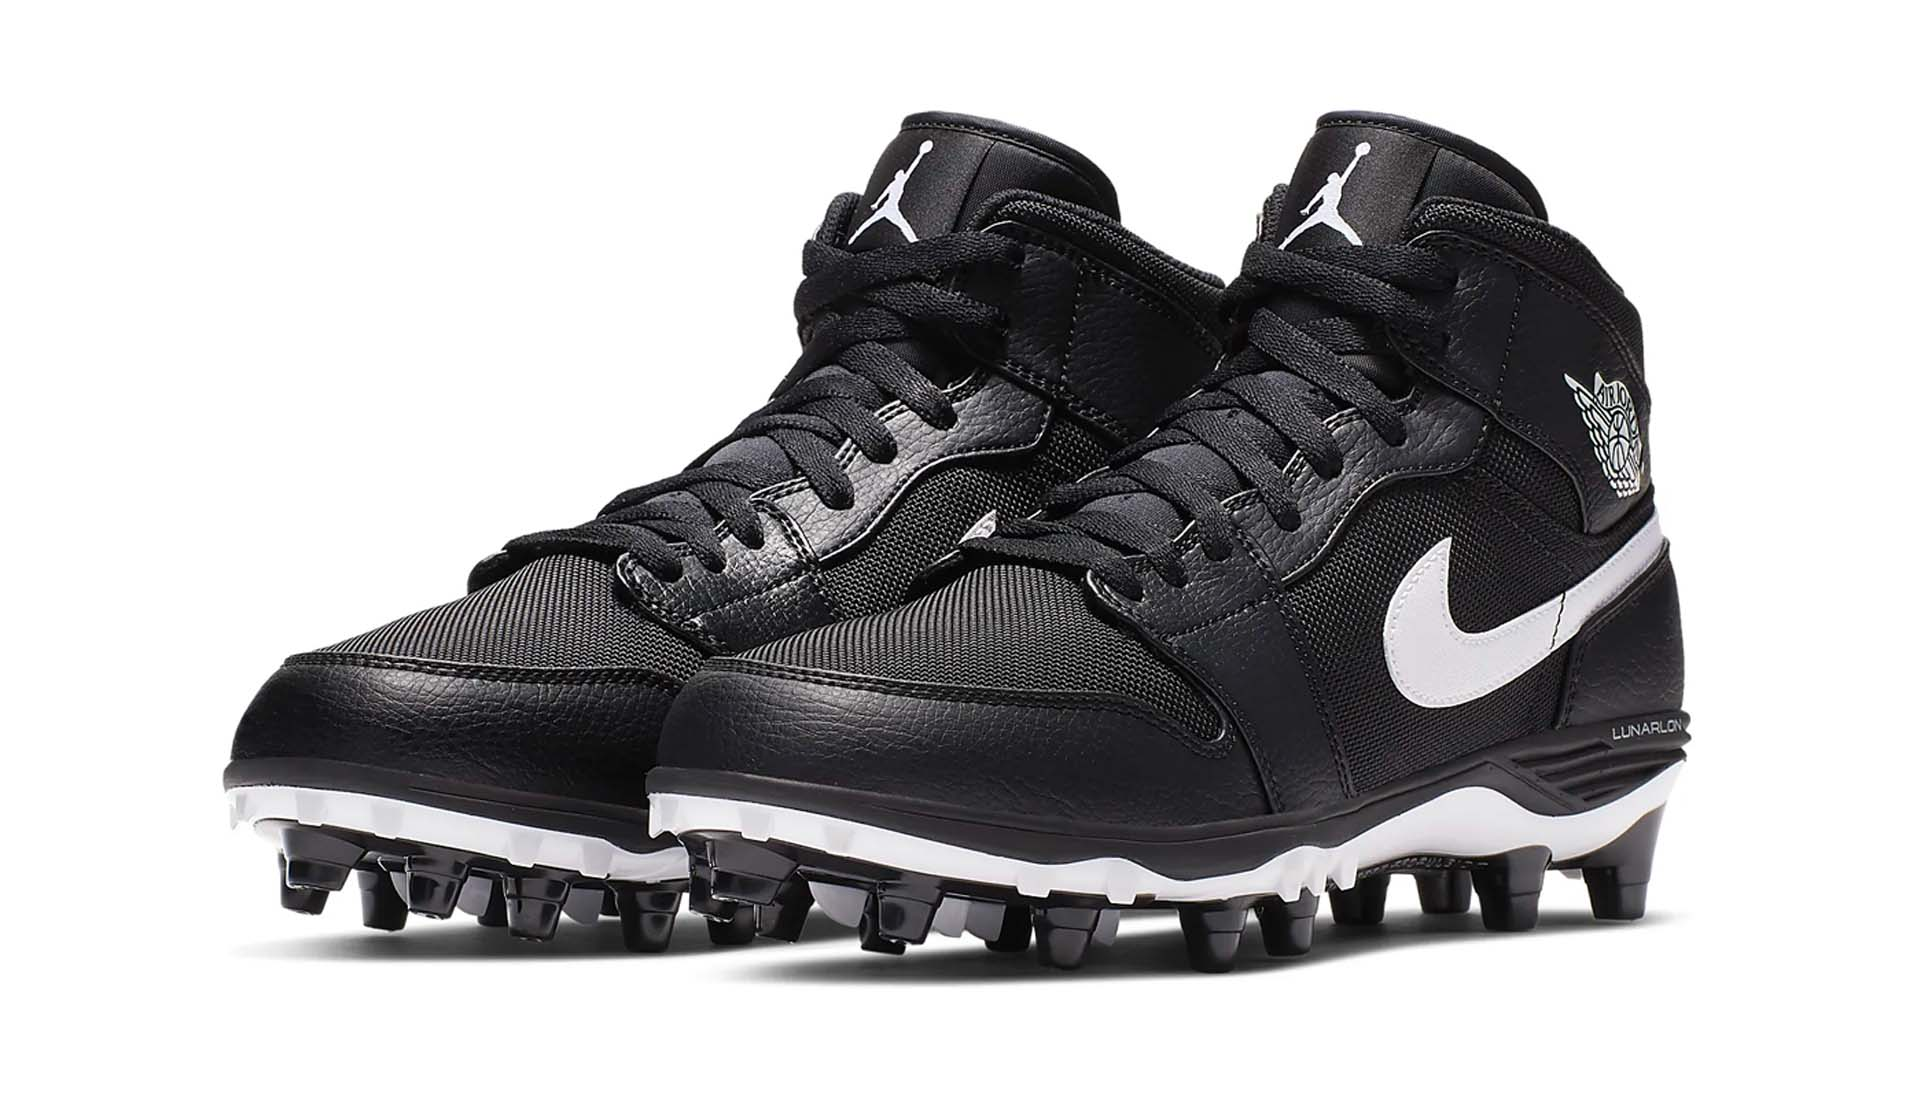 c84b27940995ff Nike Recreate The Air Jordan 1 Into Football Cleat - SoccerBible